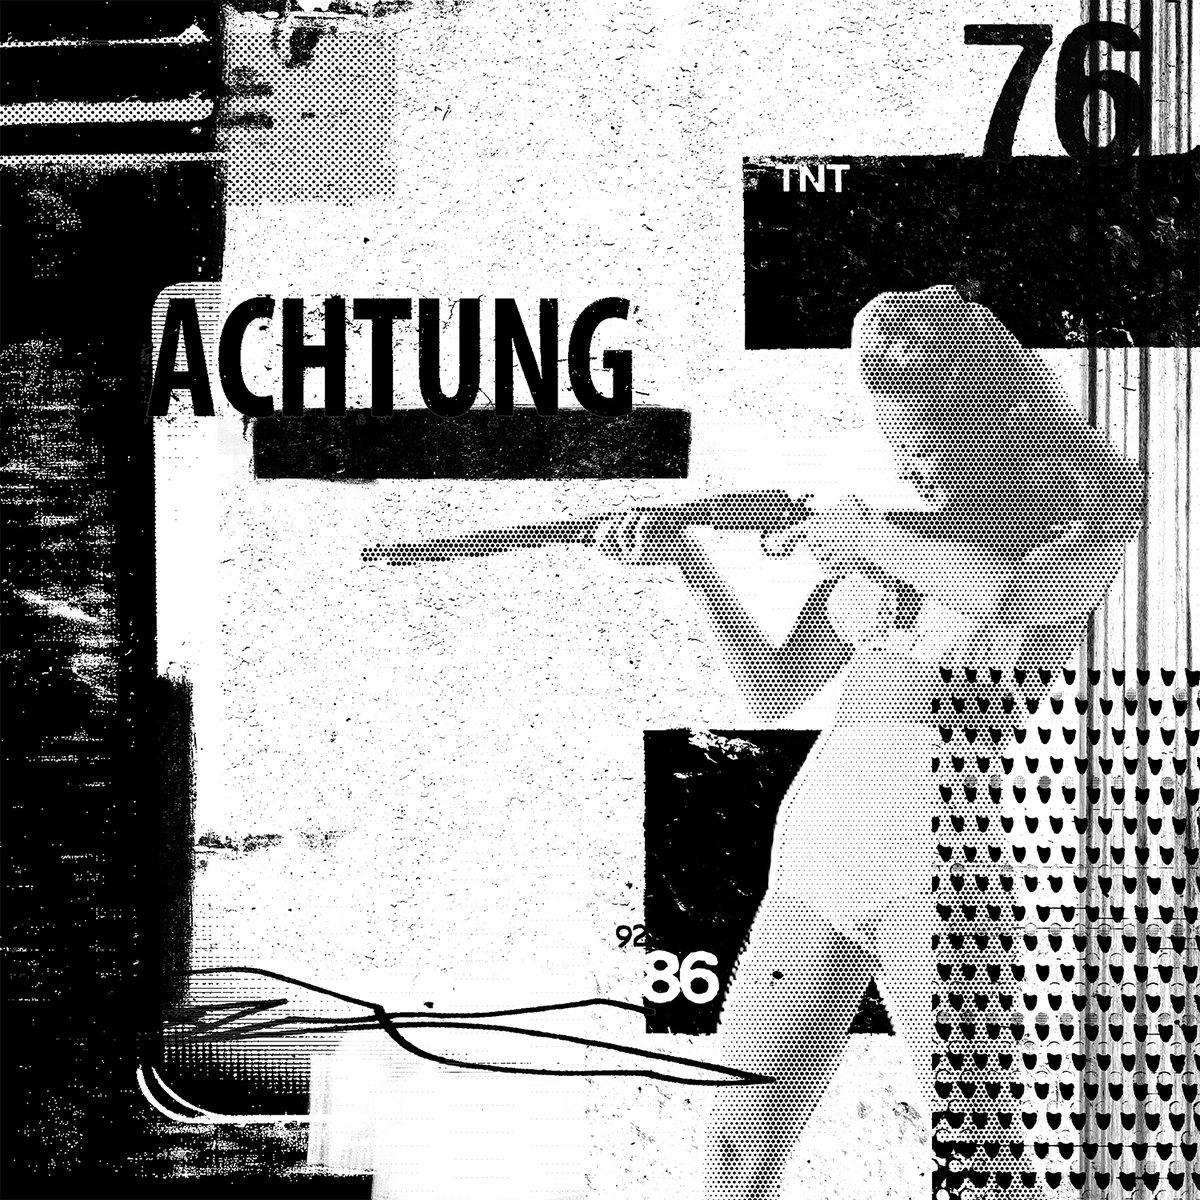 Achtung! #graphicresearch #collage #collageart #compositeart #composite #composition #design #cutandpaste #cutnpaste #digitalcollage #achtung #exploredesign #visualexperiment #graphiccomposition #grafik #graphicdesign #grafikdesign #blackandwhite #bnw #collageseries #dailydesign